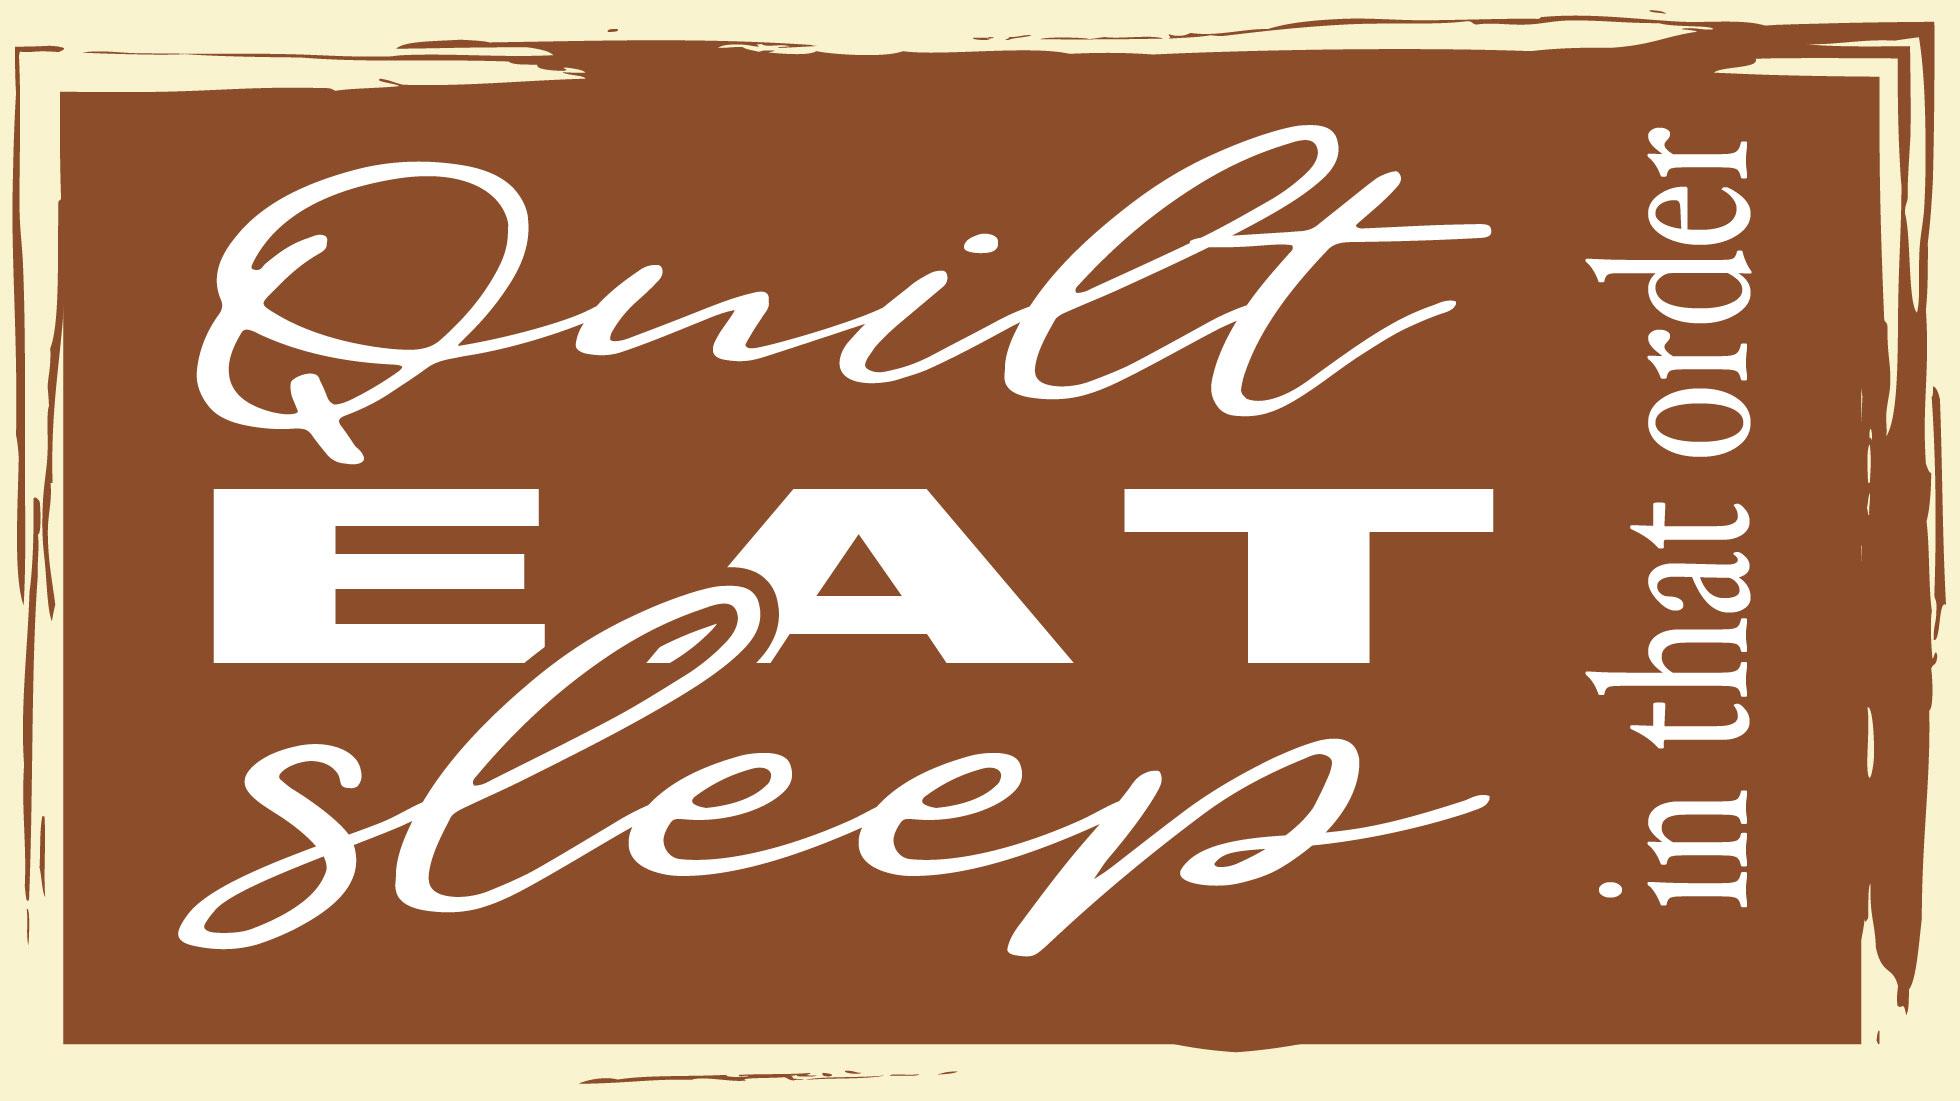 Quilt Eat Sleep